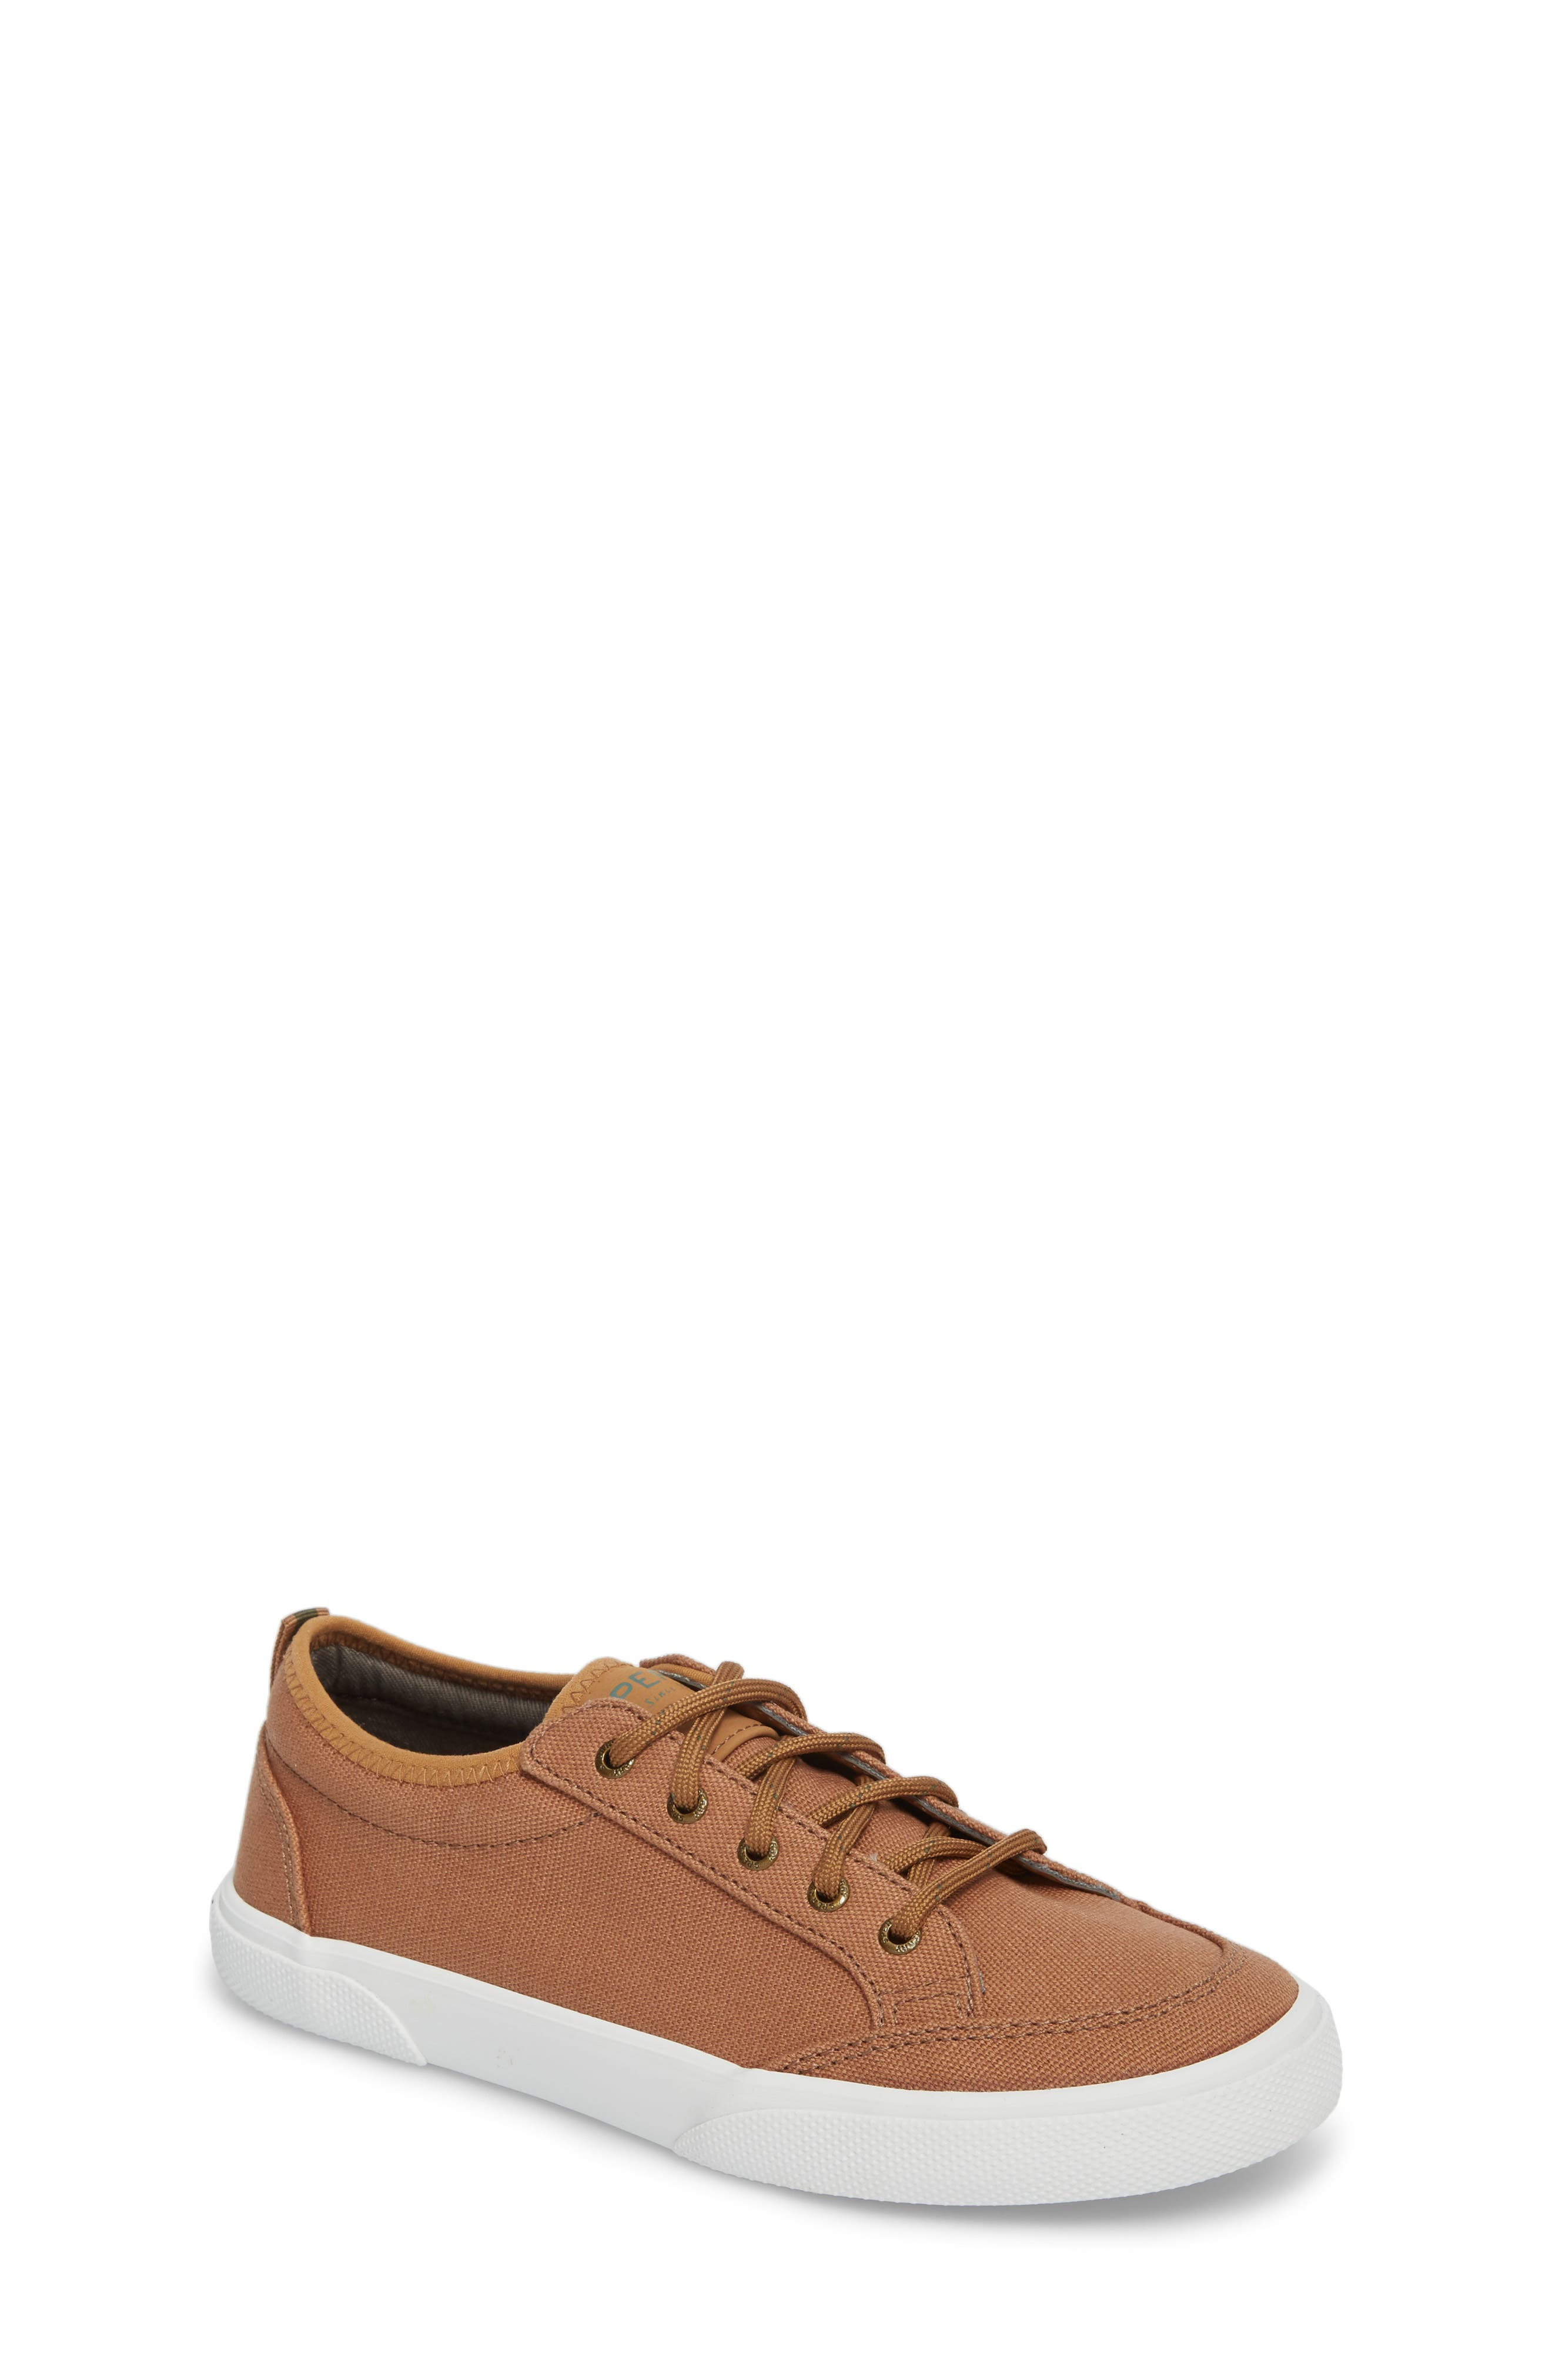 Sperry Deckfin Sneaker,                             Main thumbnail 1, color,                             Caramel